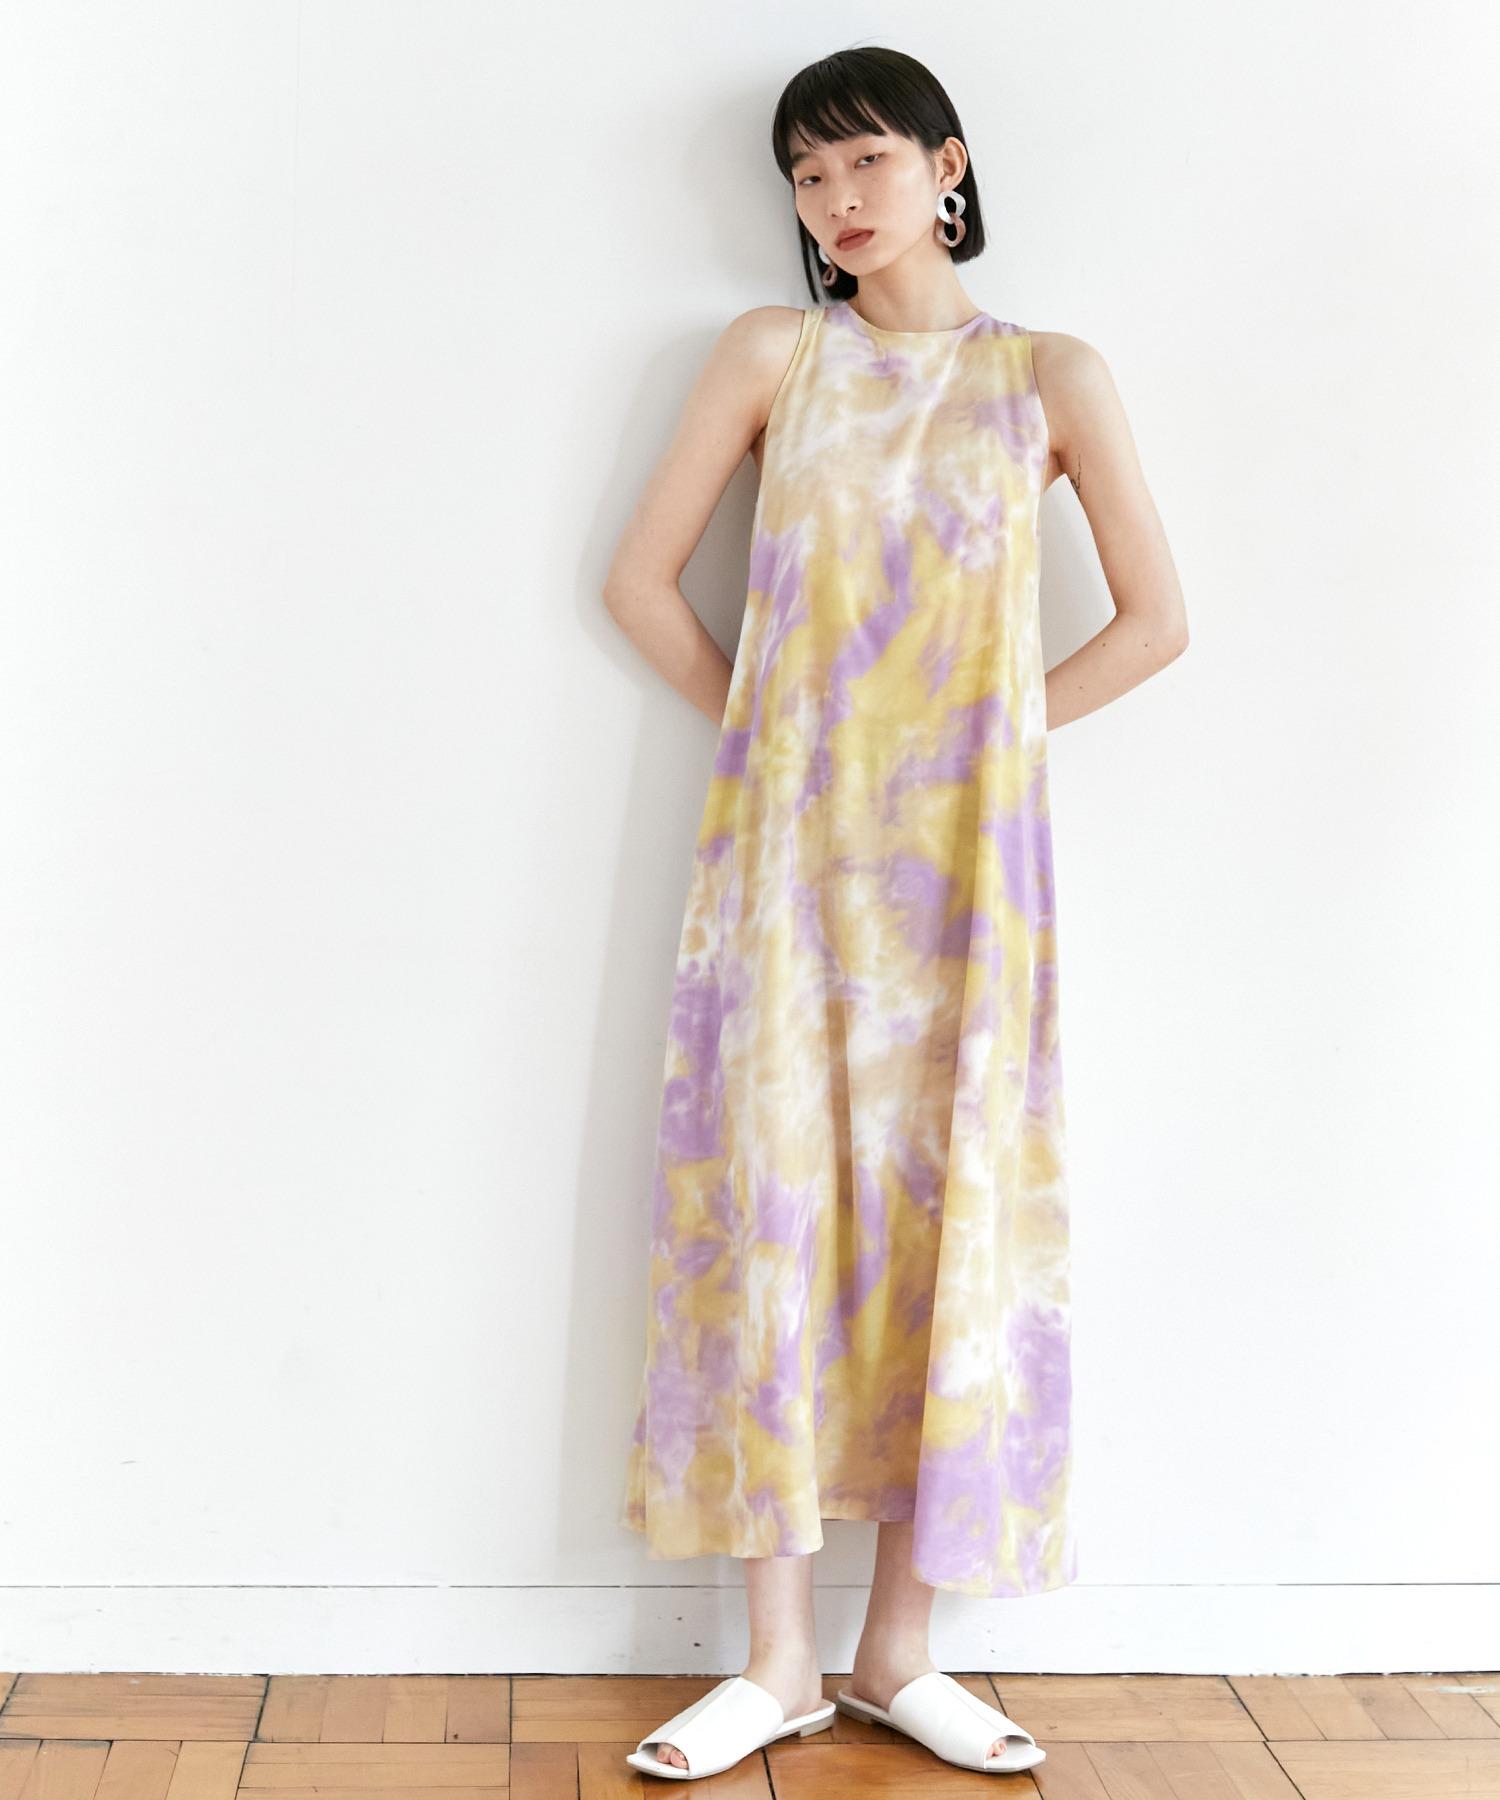 【EMMA】水彩アートプリントバックオープンノースリーブワンピース